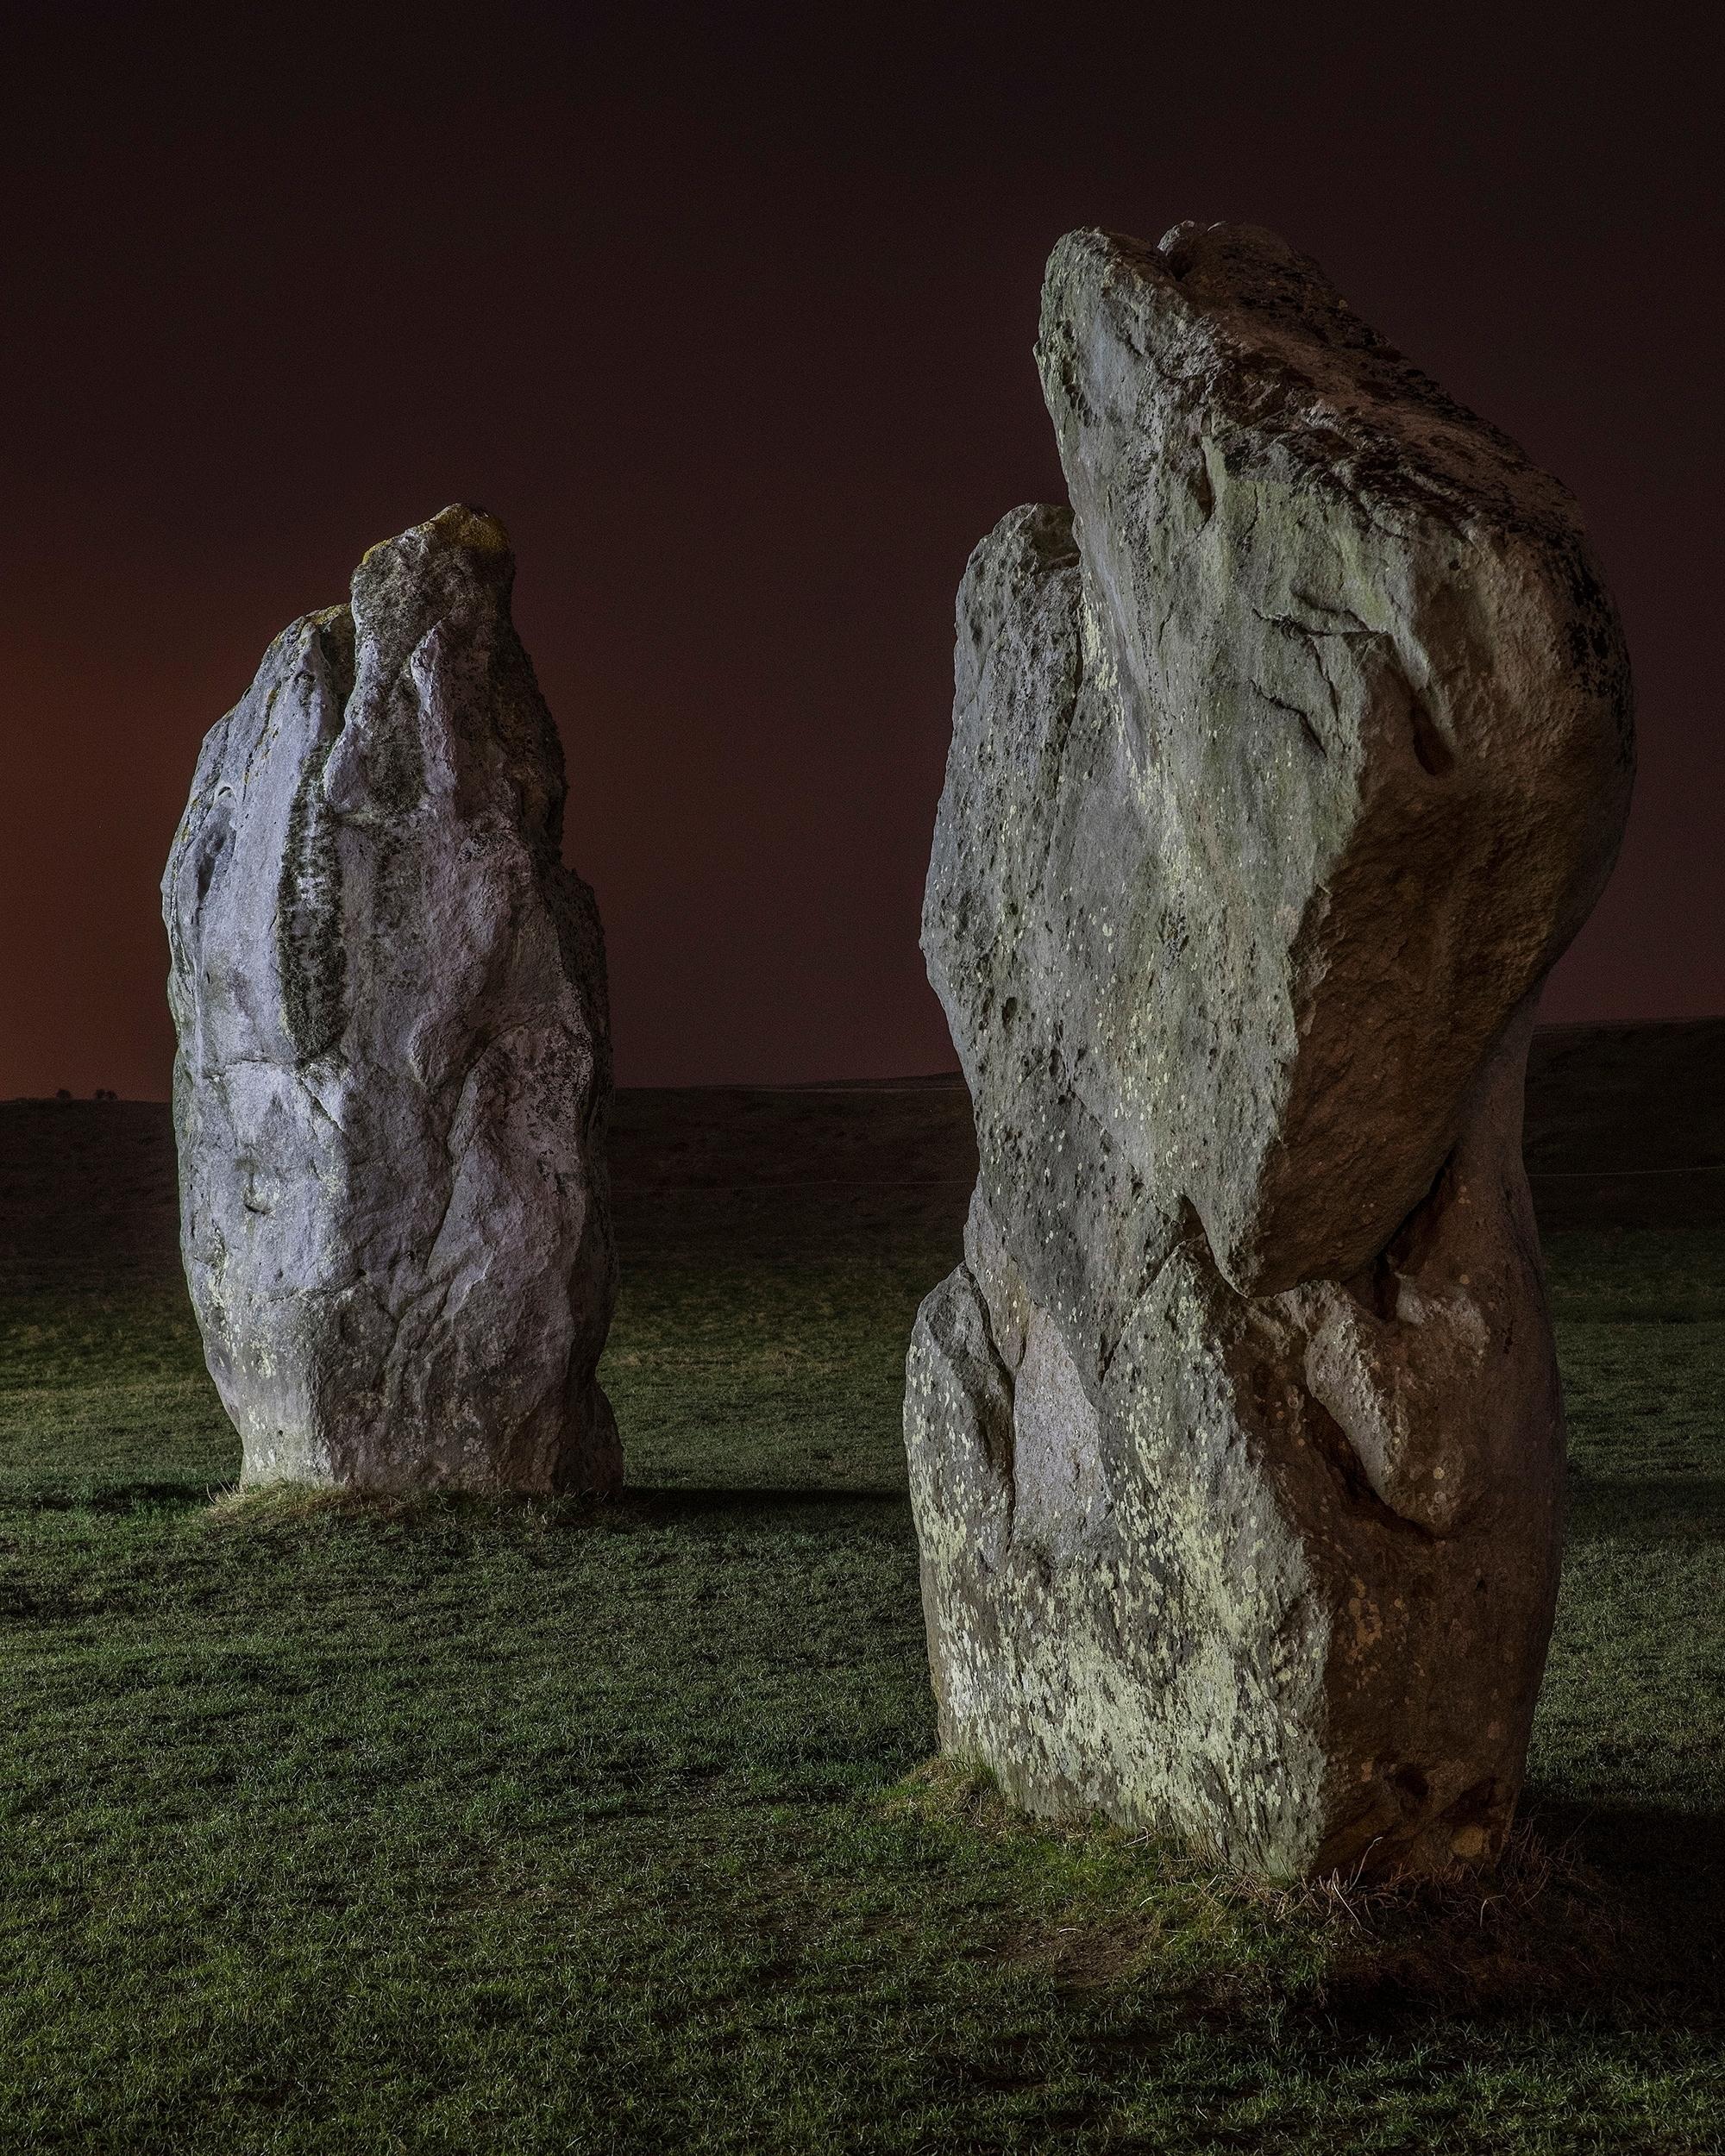 Avebury Stones late night light - forgottenheritage | ello